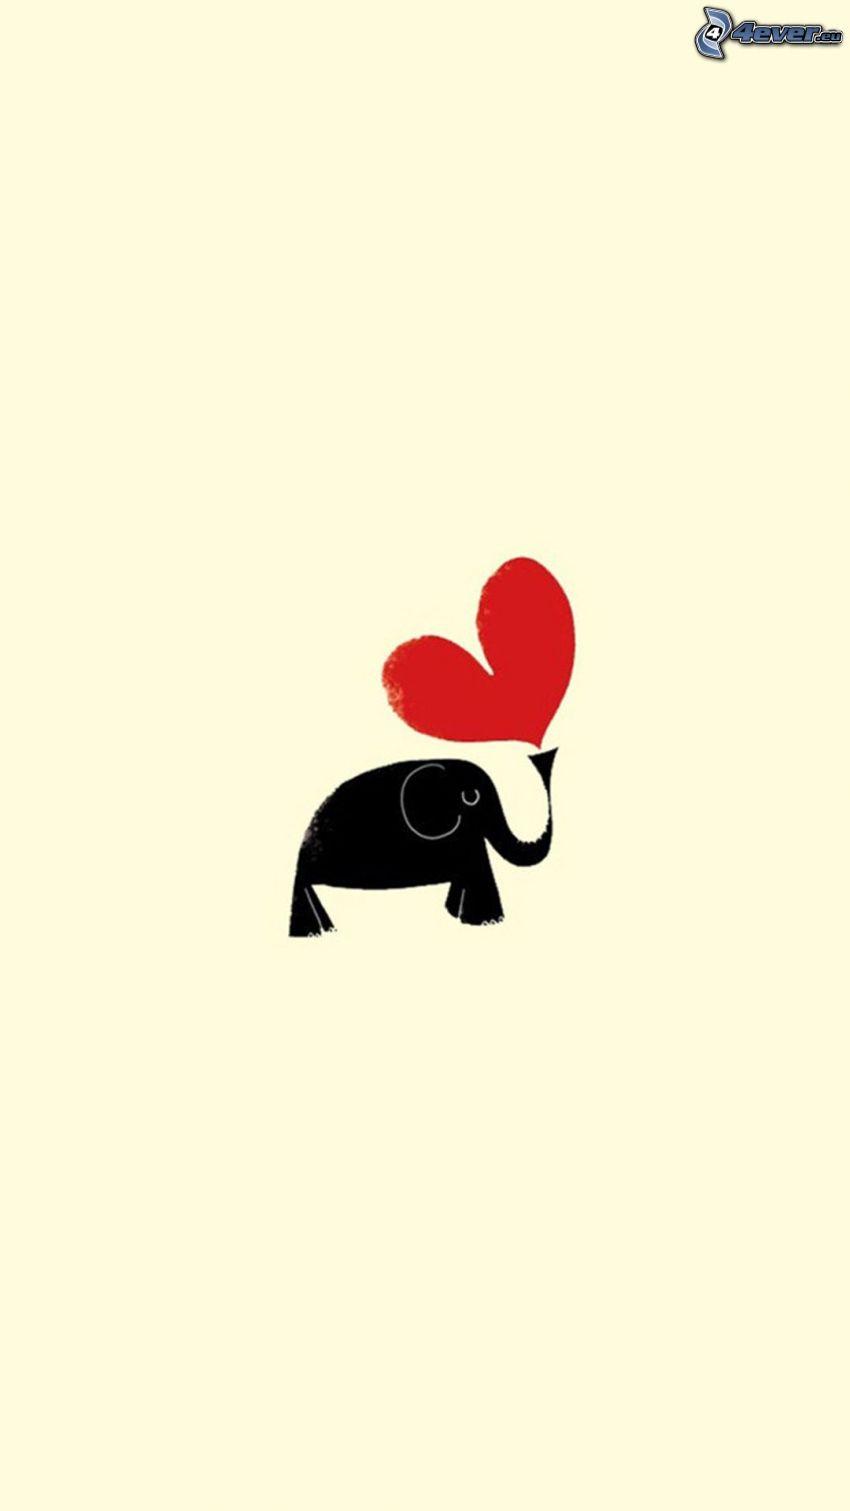 elephant, heart